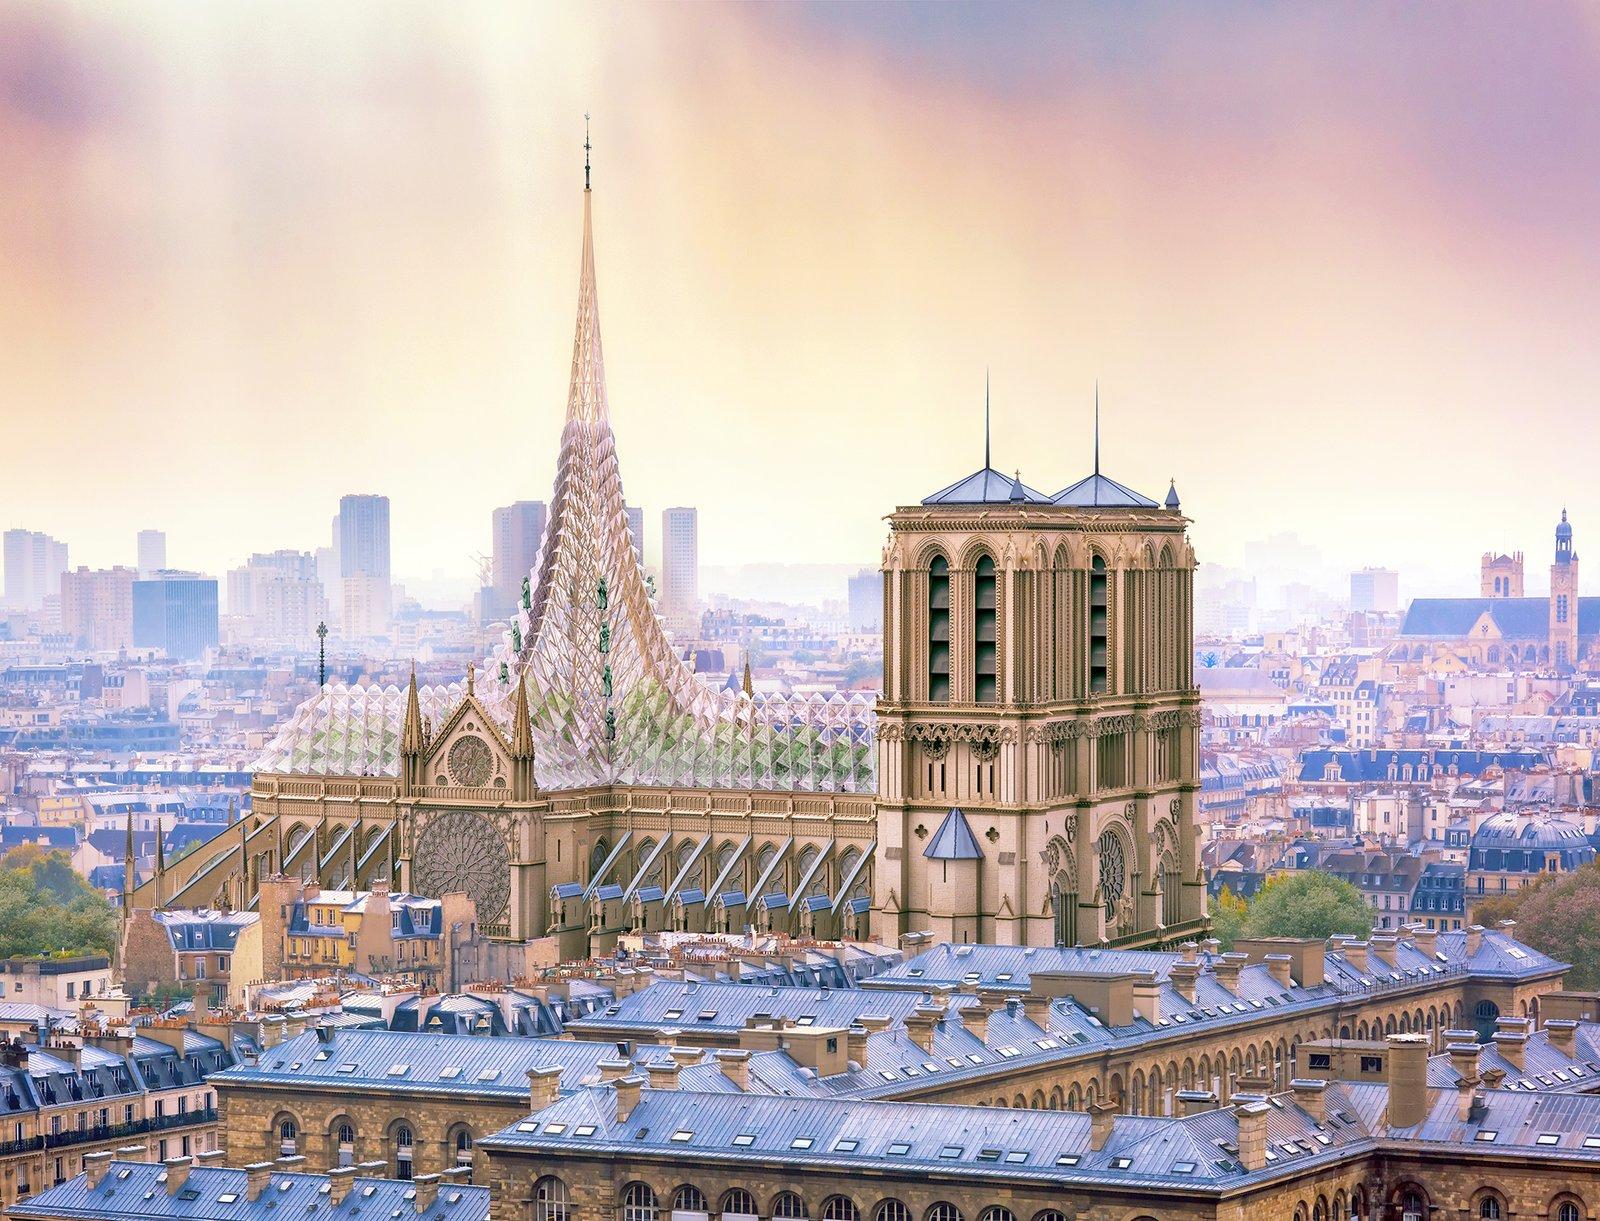 Notre Dame Cathedral Urban Farm exterior